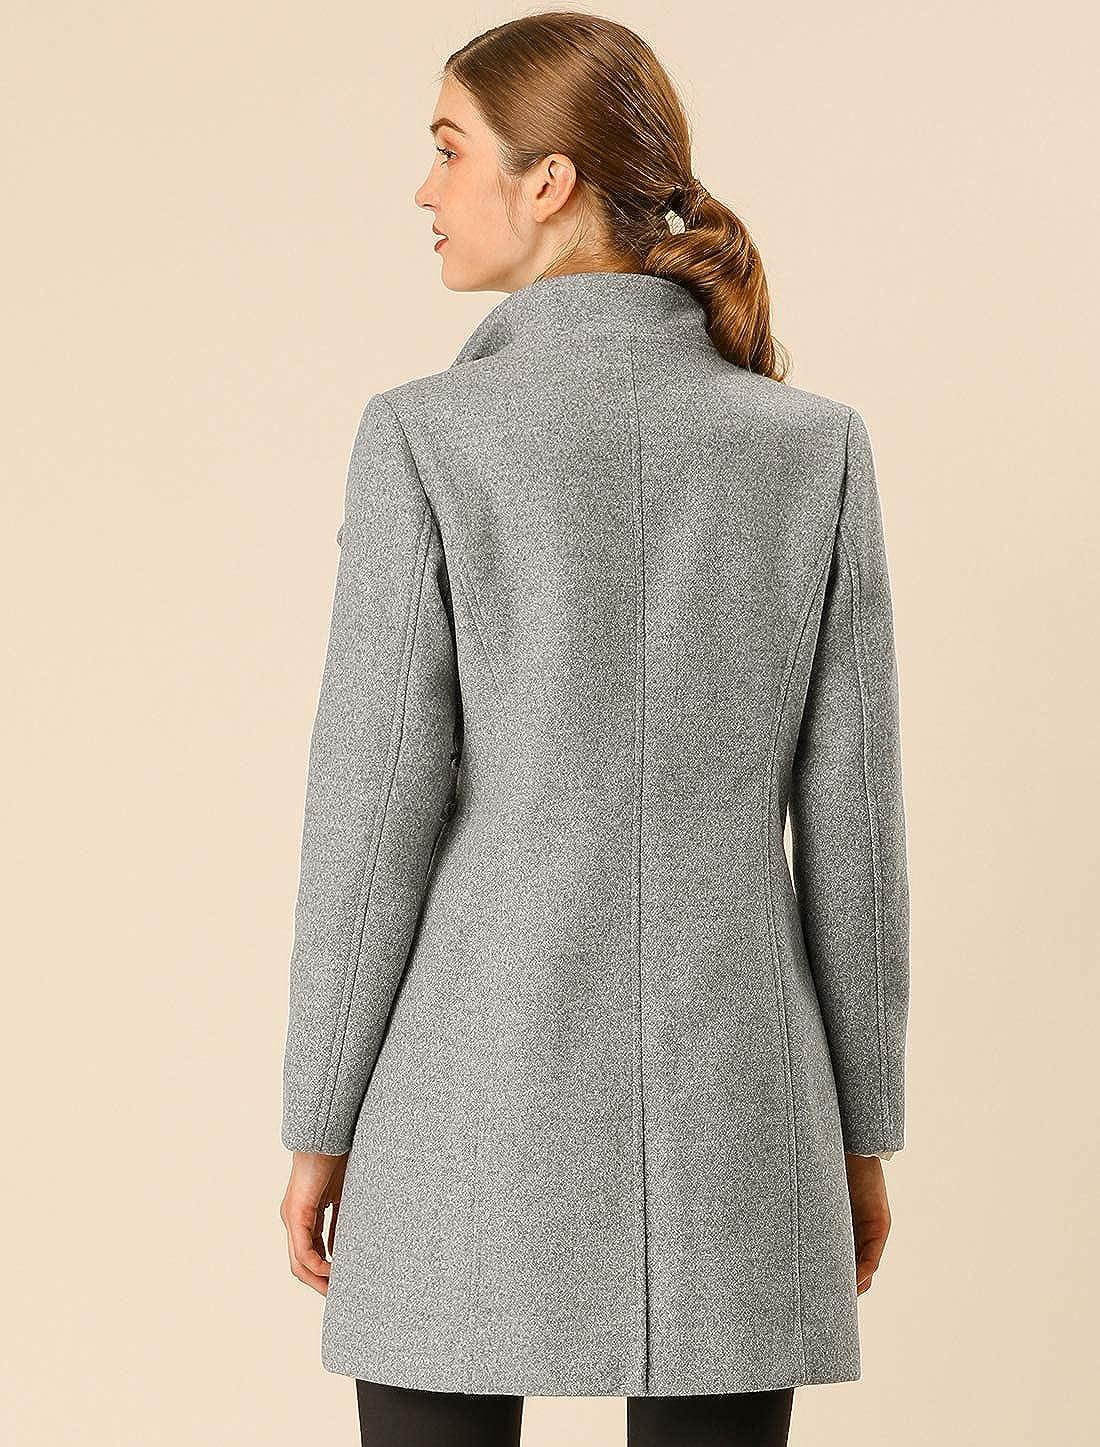 Allegra K Damen Langarm Stehkragen Bindegürtel Trenchcoat Mantel Grau